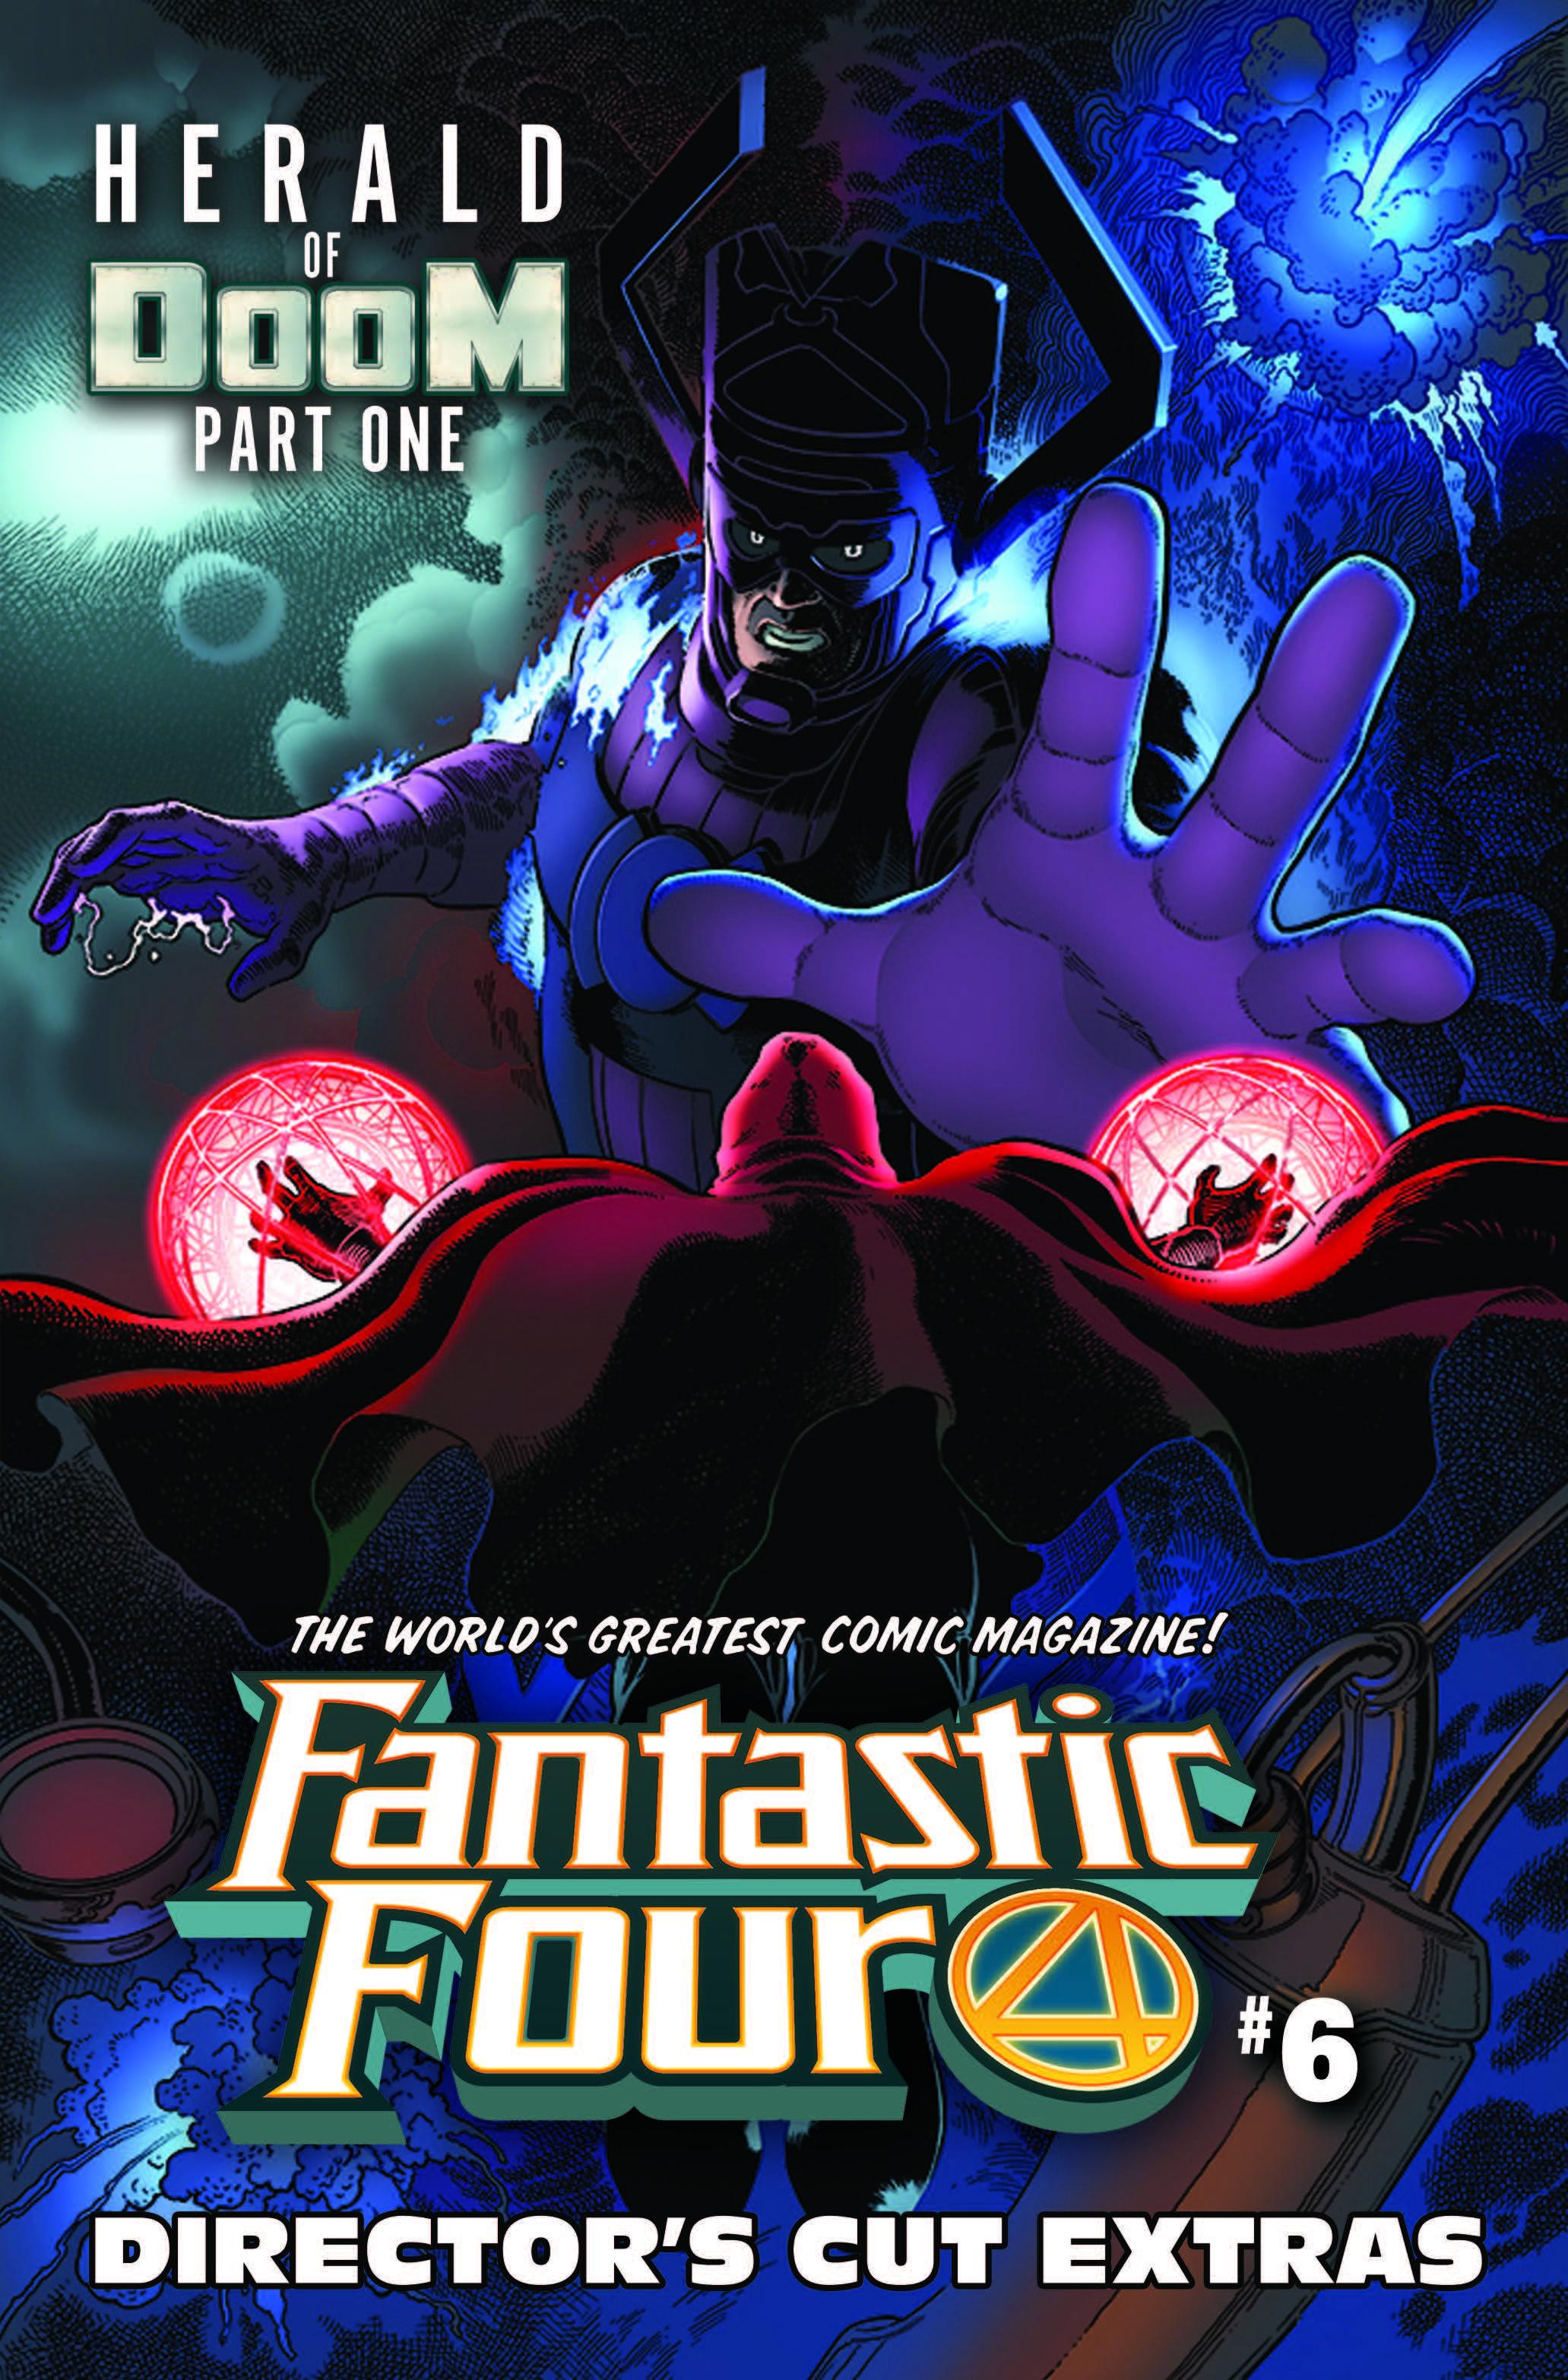 Fantastic Four (2018) #6_Director's Cut